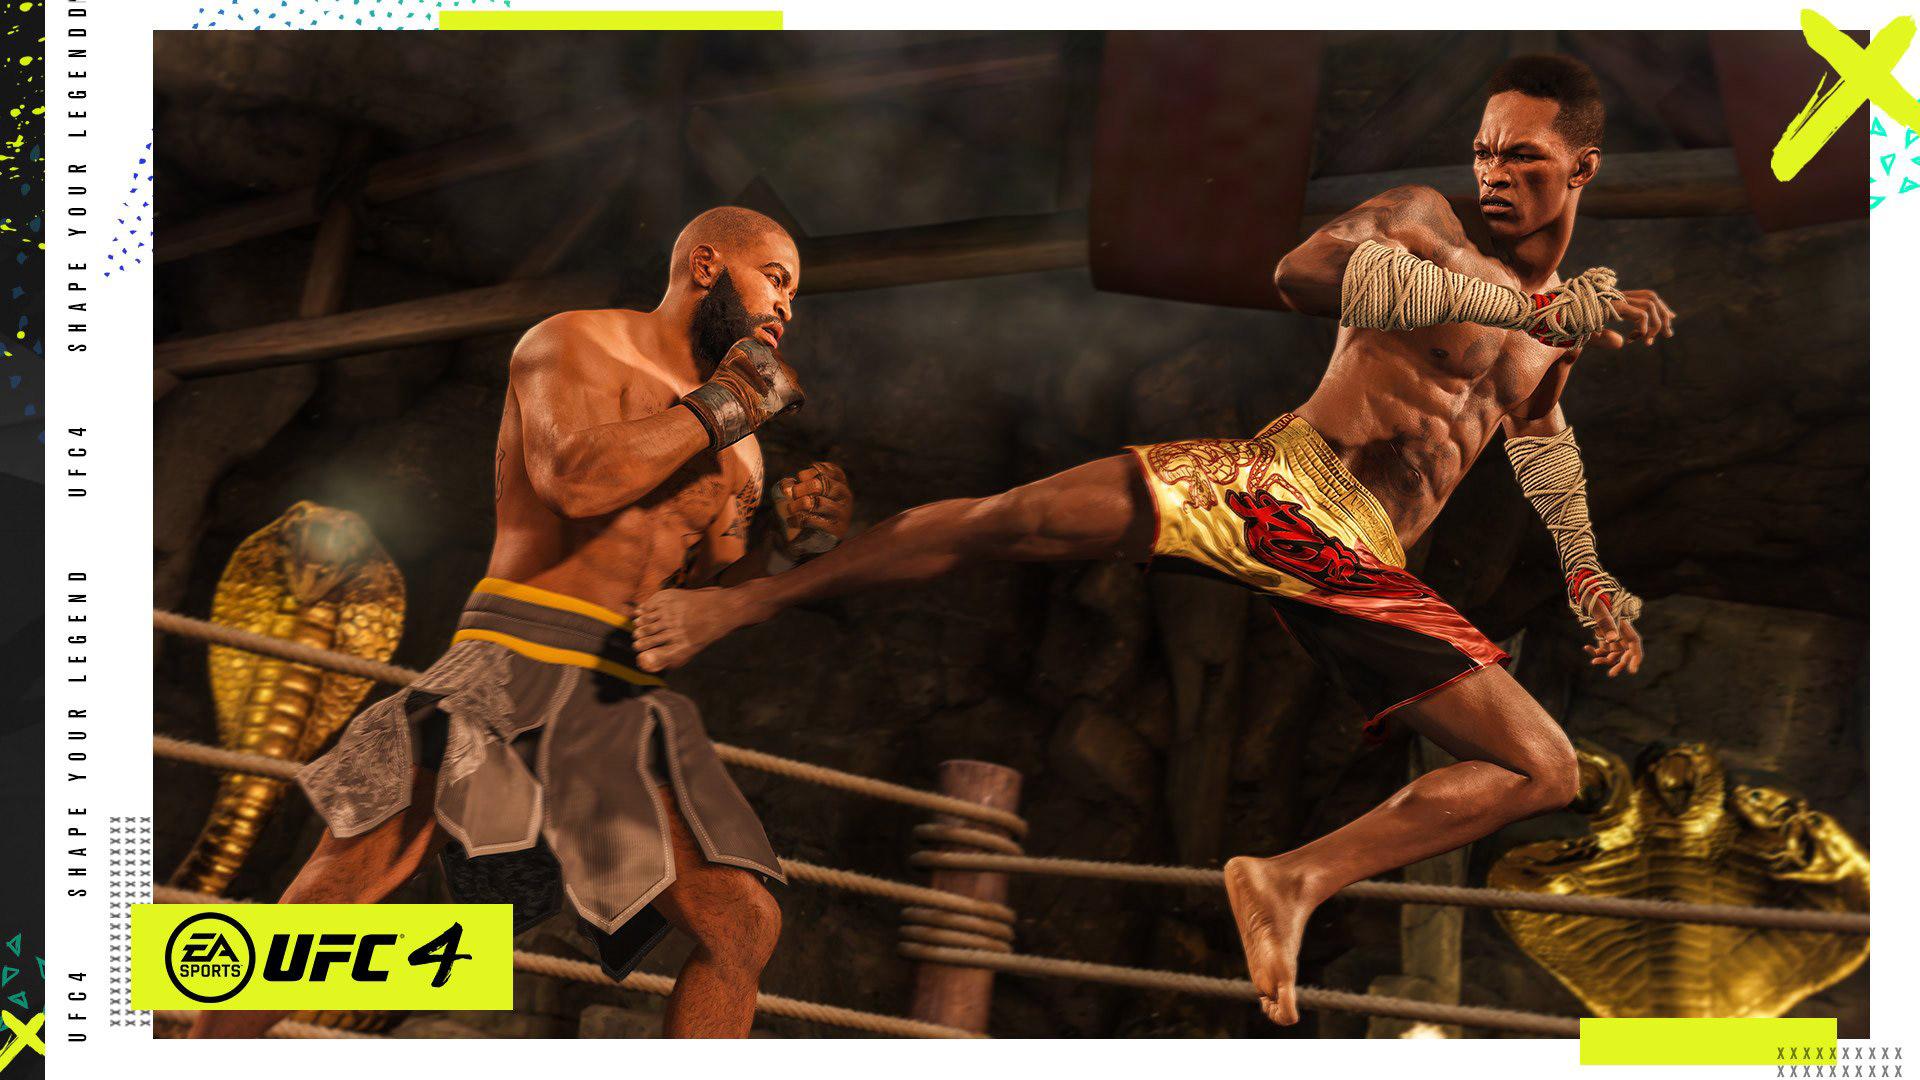 Free UFC 4 Wallpaper in 1920x1080